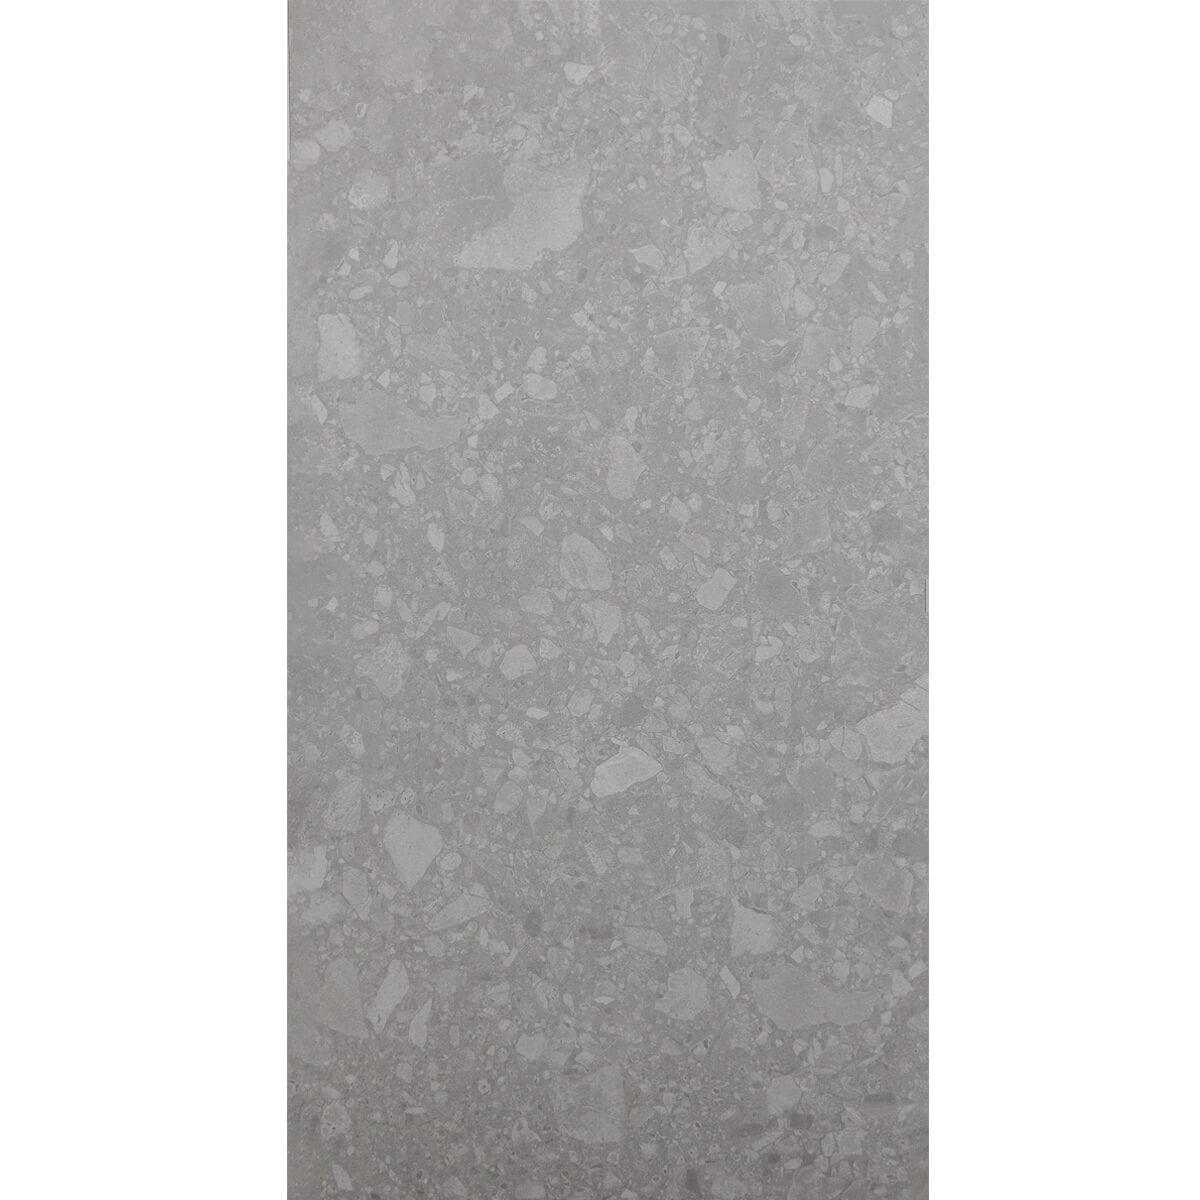 T10916 Stardust Grey Matte